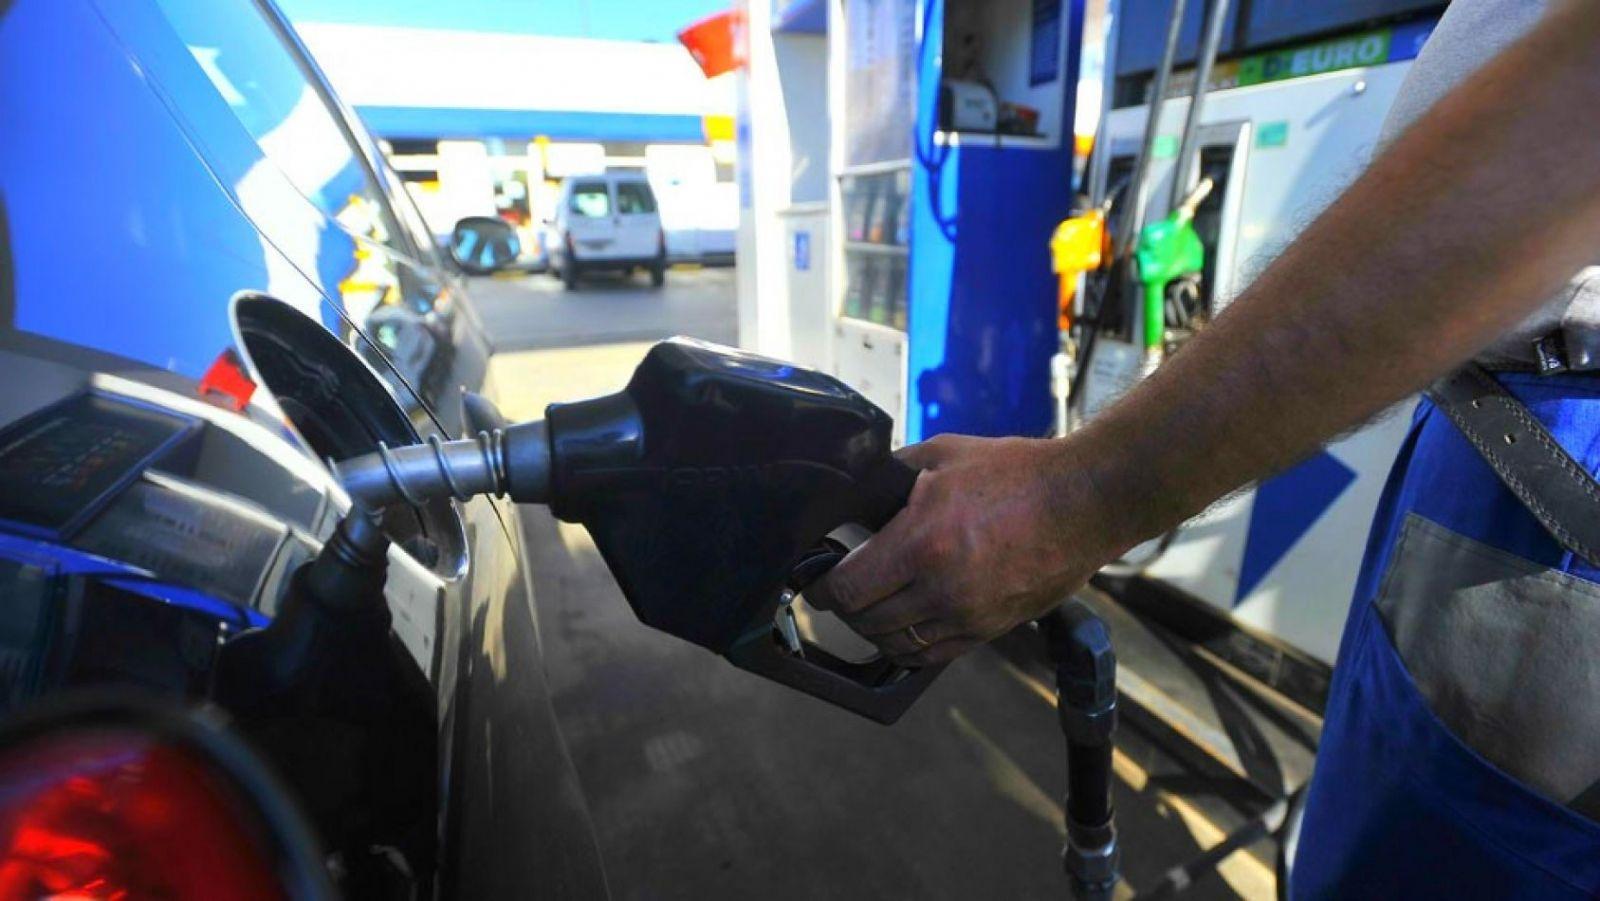 La nafta subió un 108,5% desde que asumió Macri